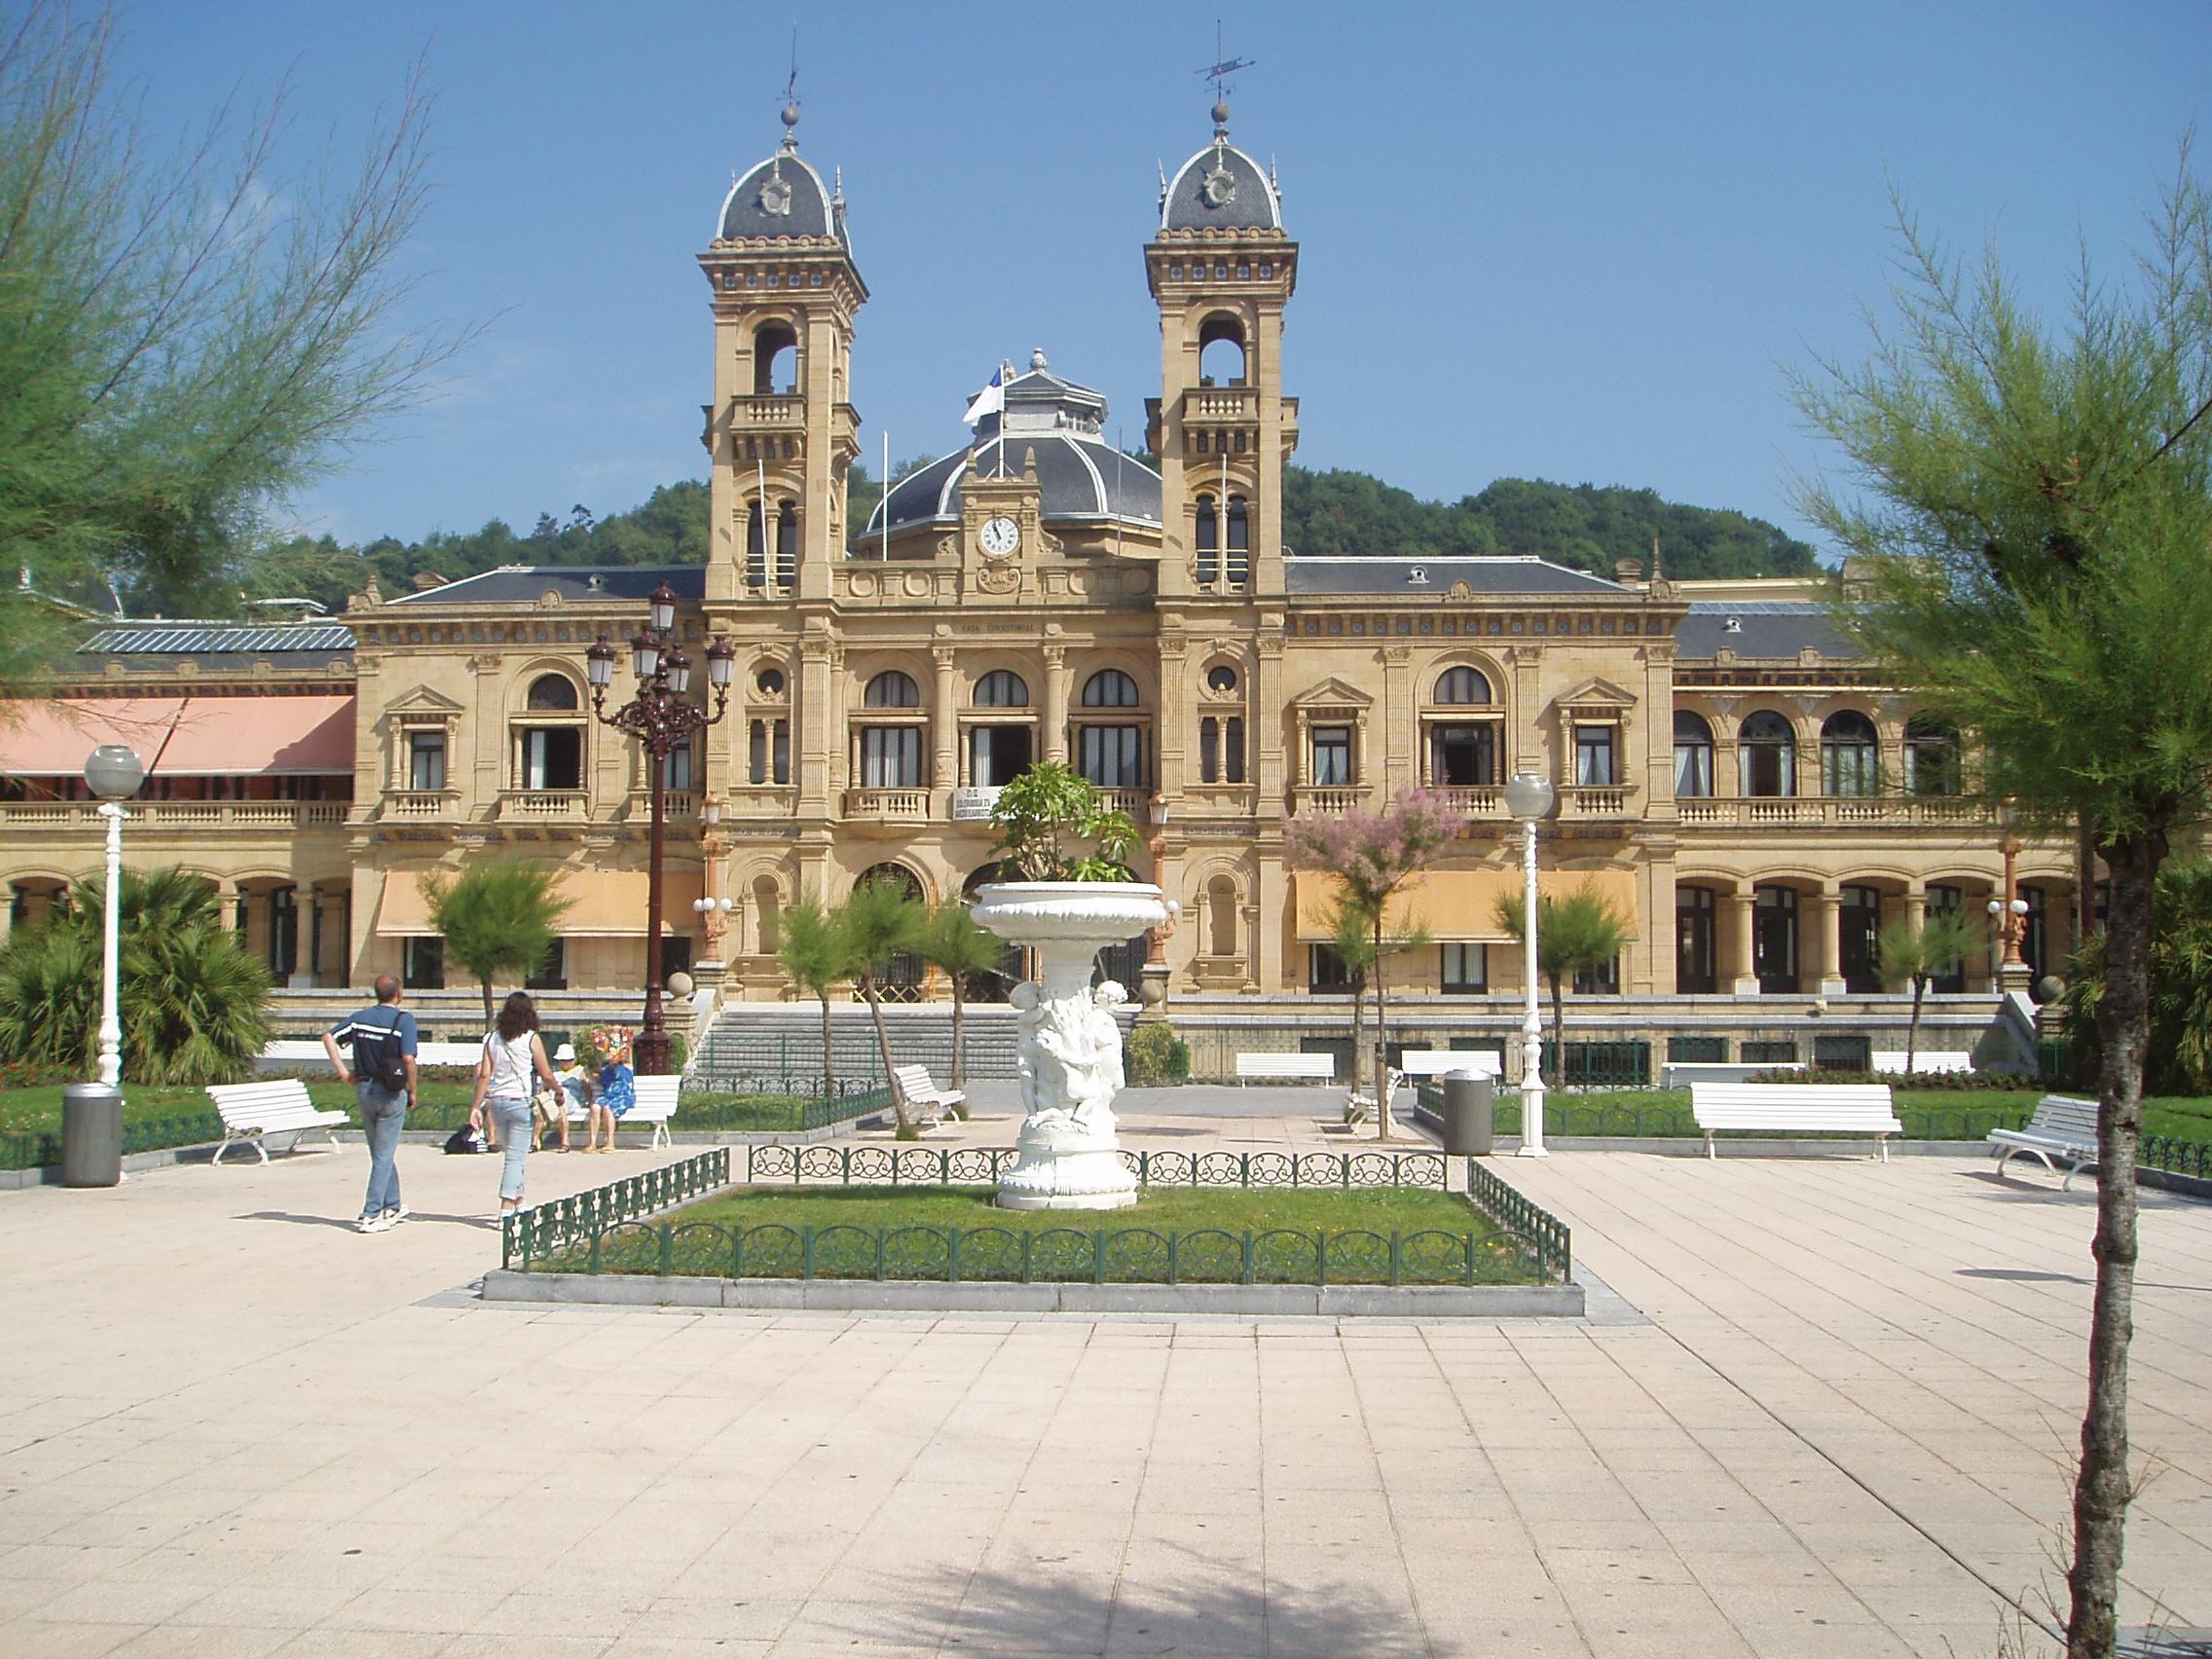 File:Ayuntamiento-S.S.Center.jpg - Wikimedia Commons